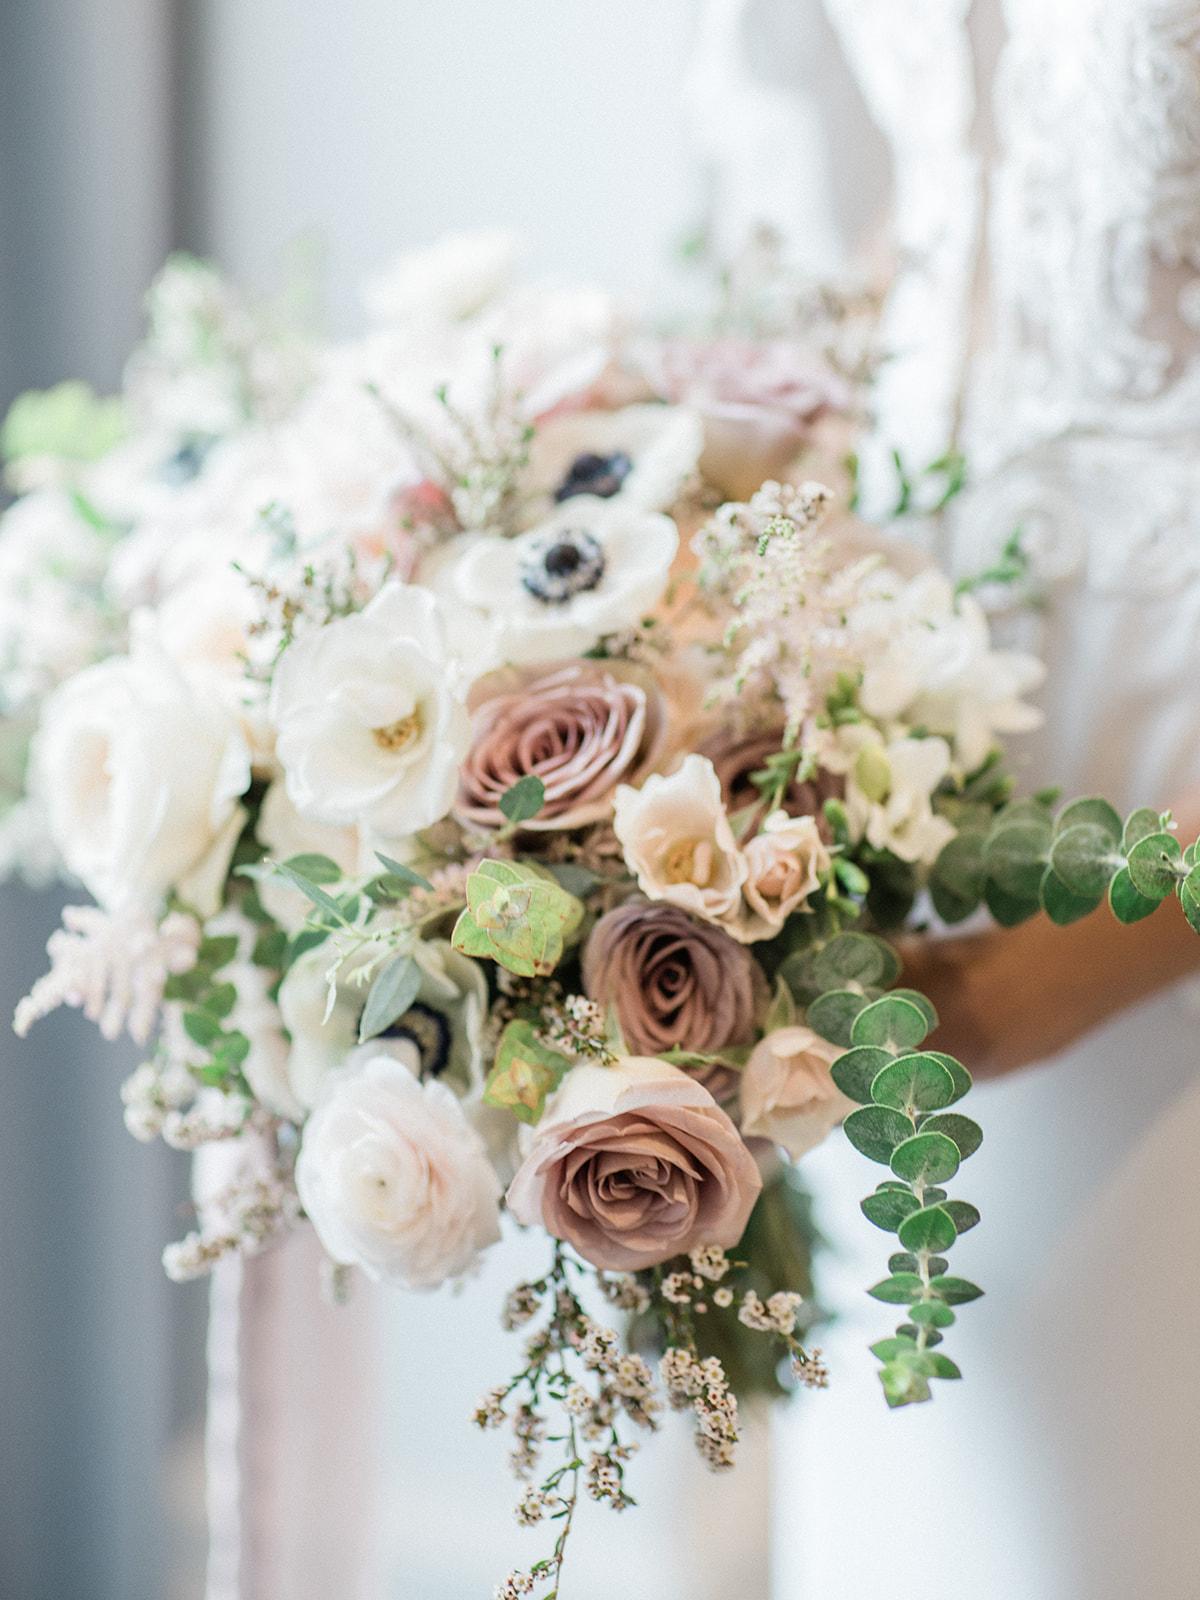 LisaCatherinePhotography_Jasmeen&Darren_Wedding-1077_websize.jpg